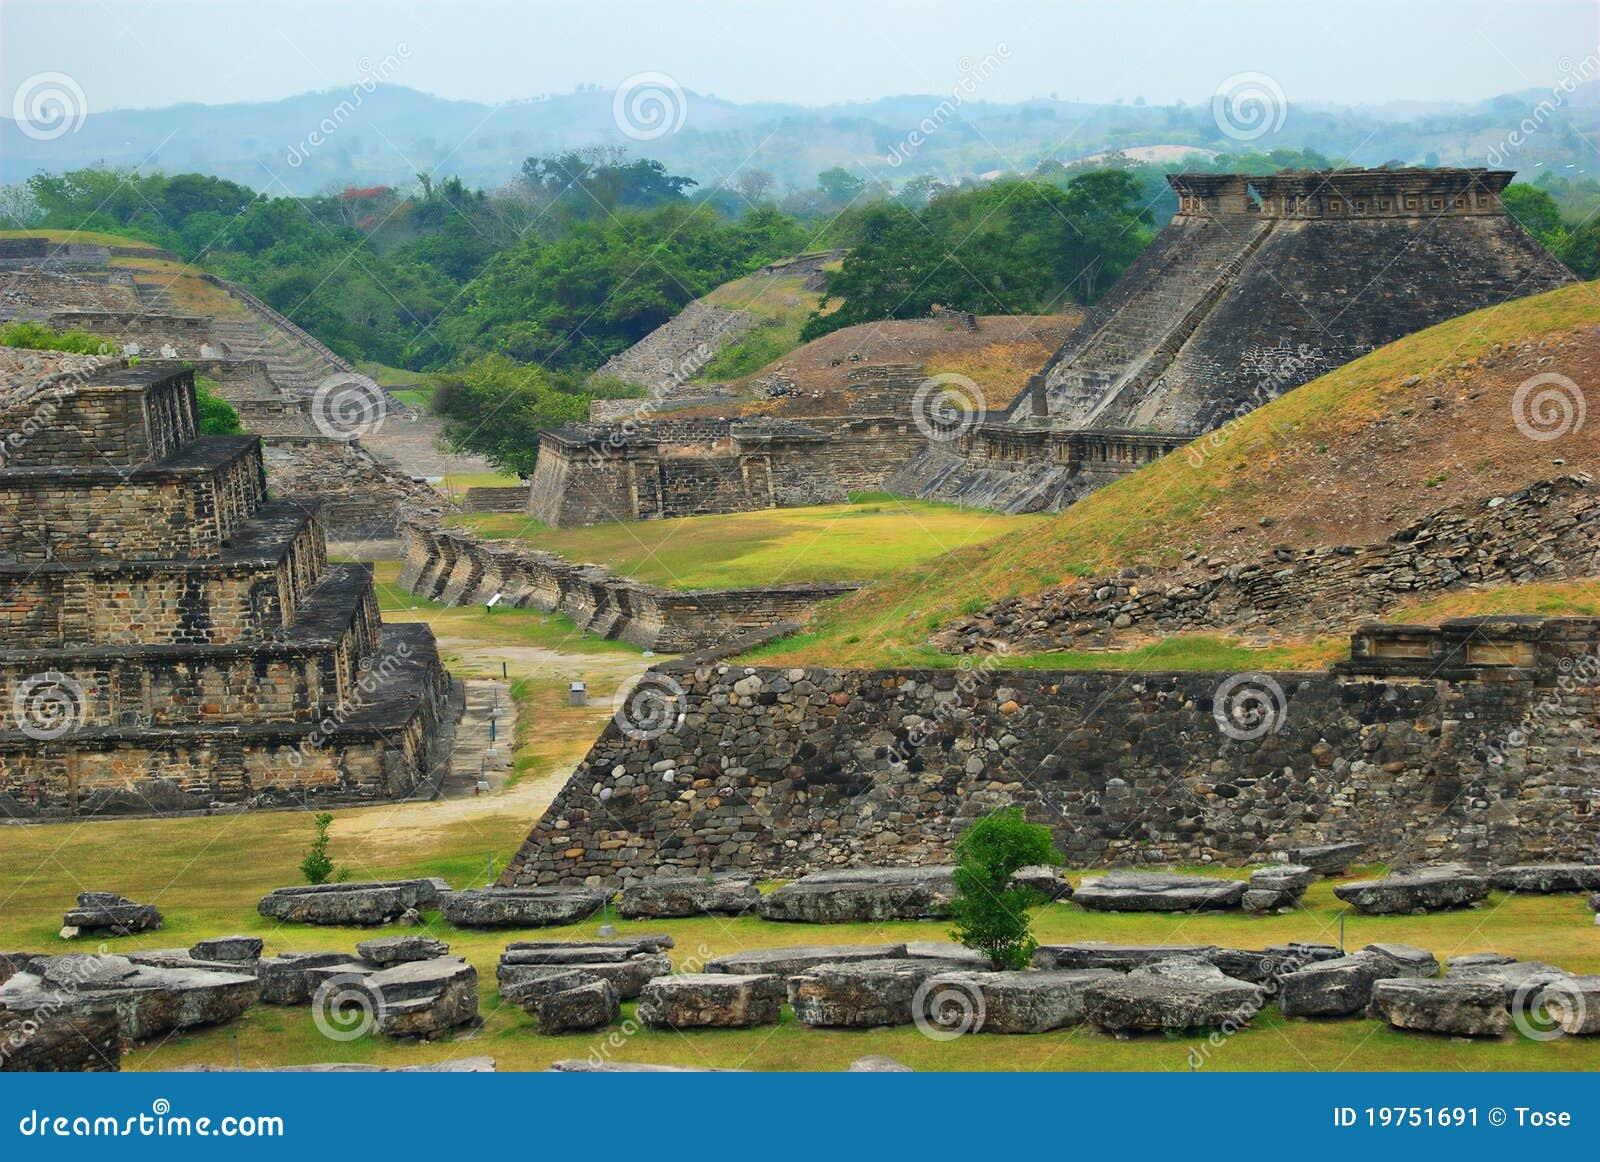 Rovine Archaeological di EL Tajin, Veracruz, Messico